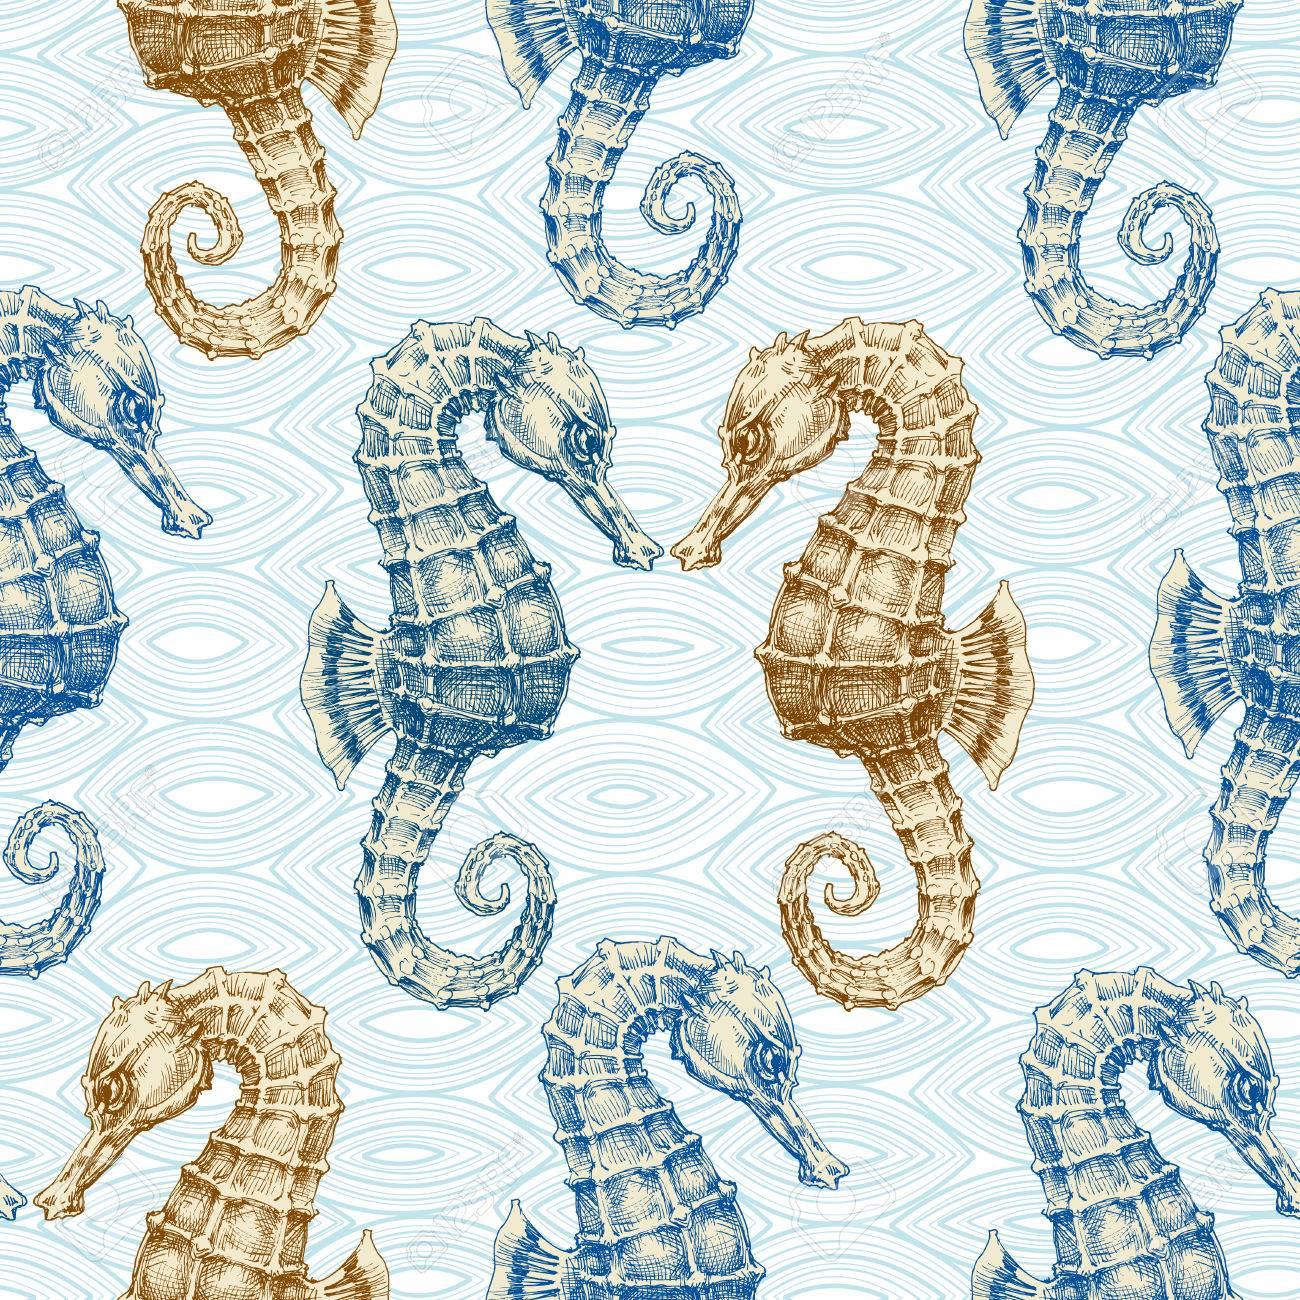 Sea Horse Vector Seamless Pattern Marine Life Print Royalty Free Cliparts Vectors And Stock Illustration Image 58689766